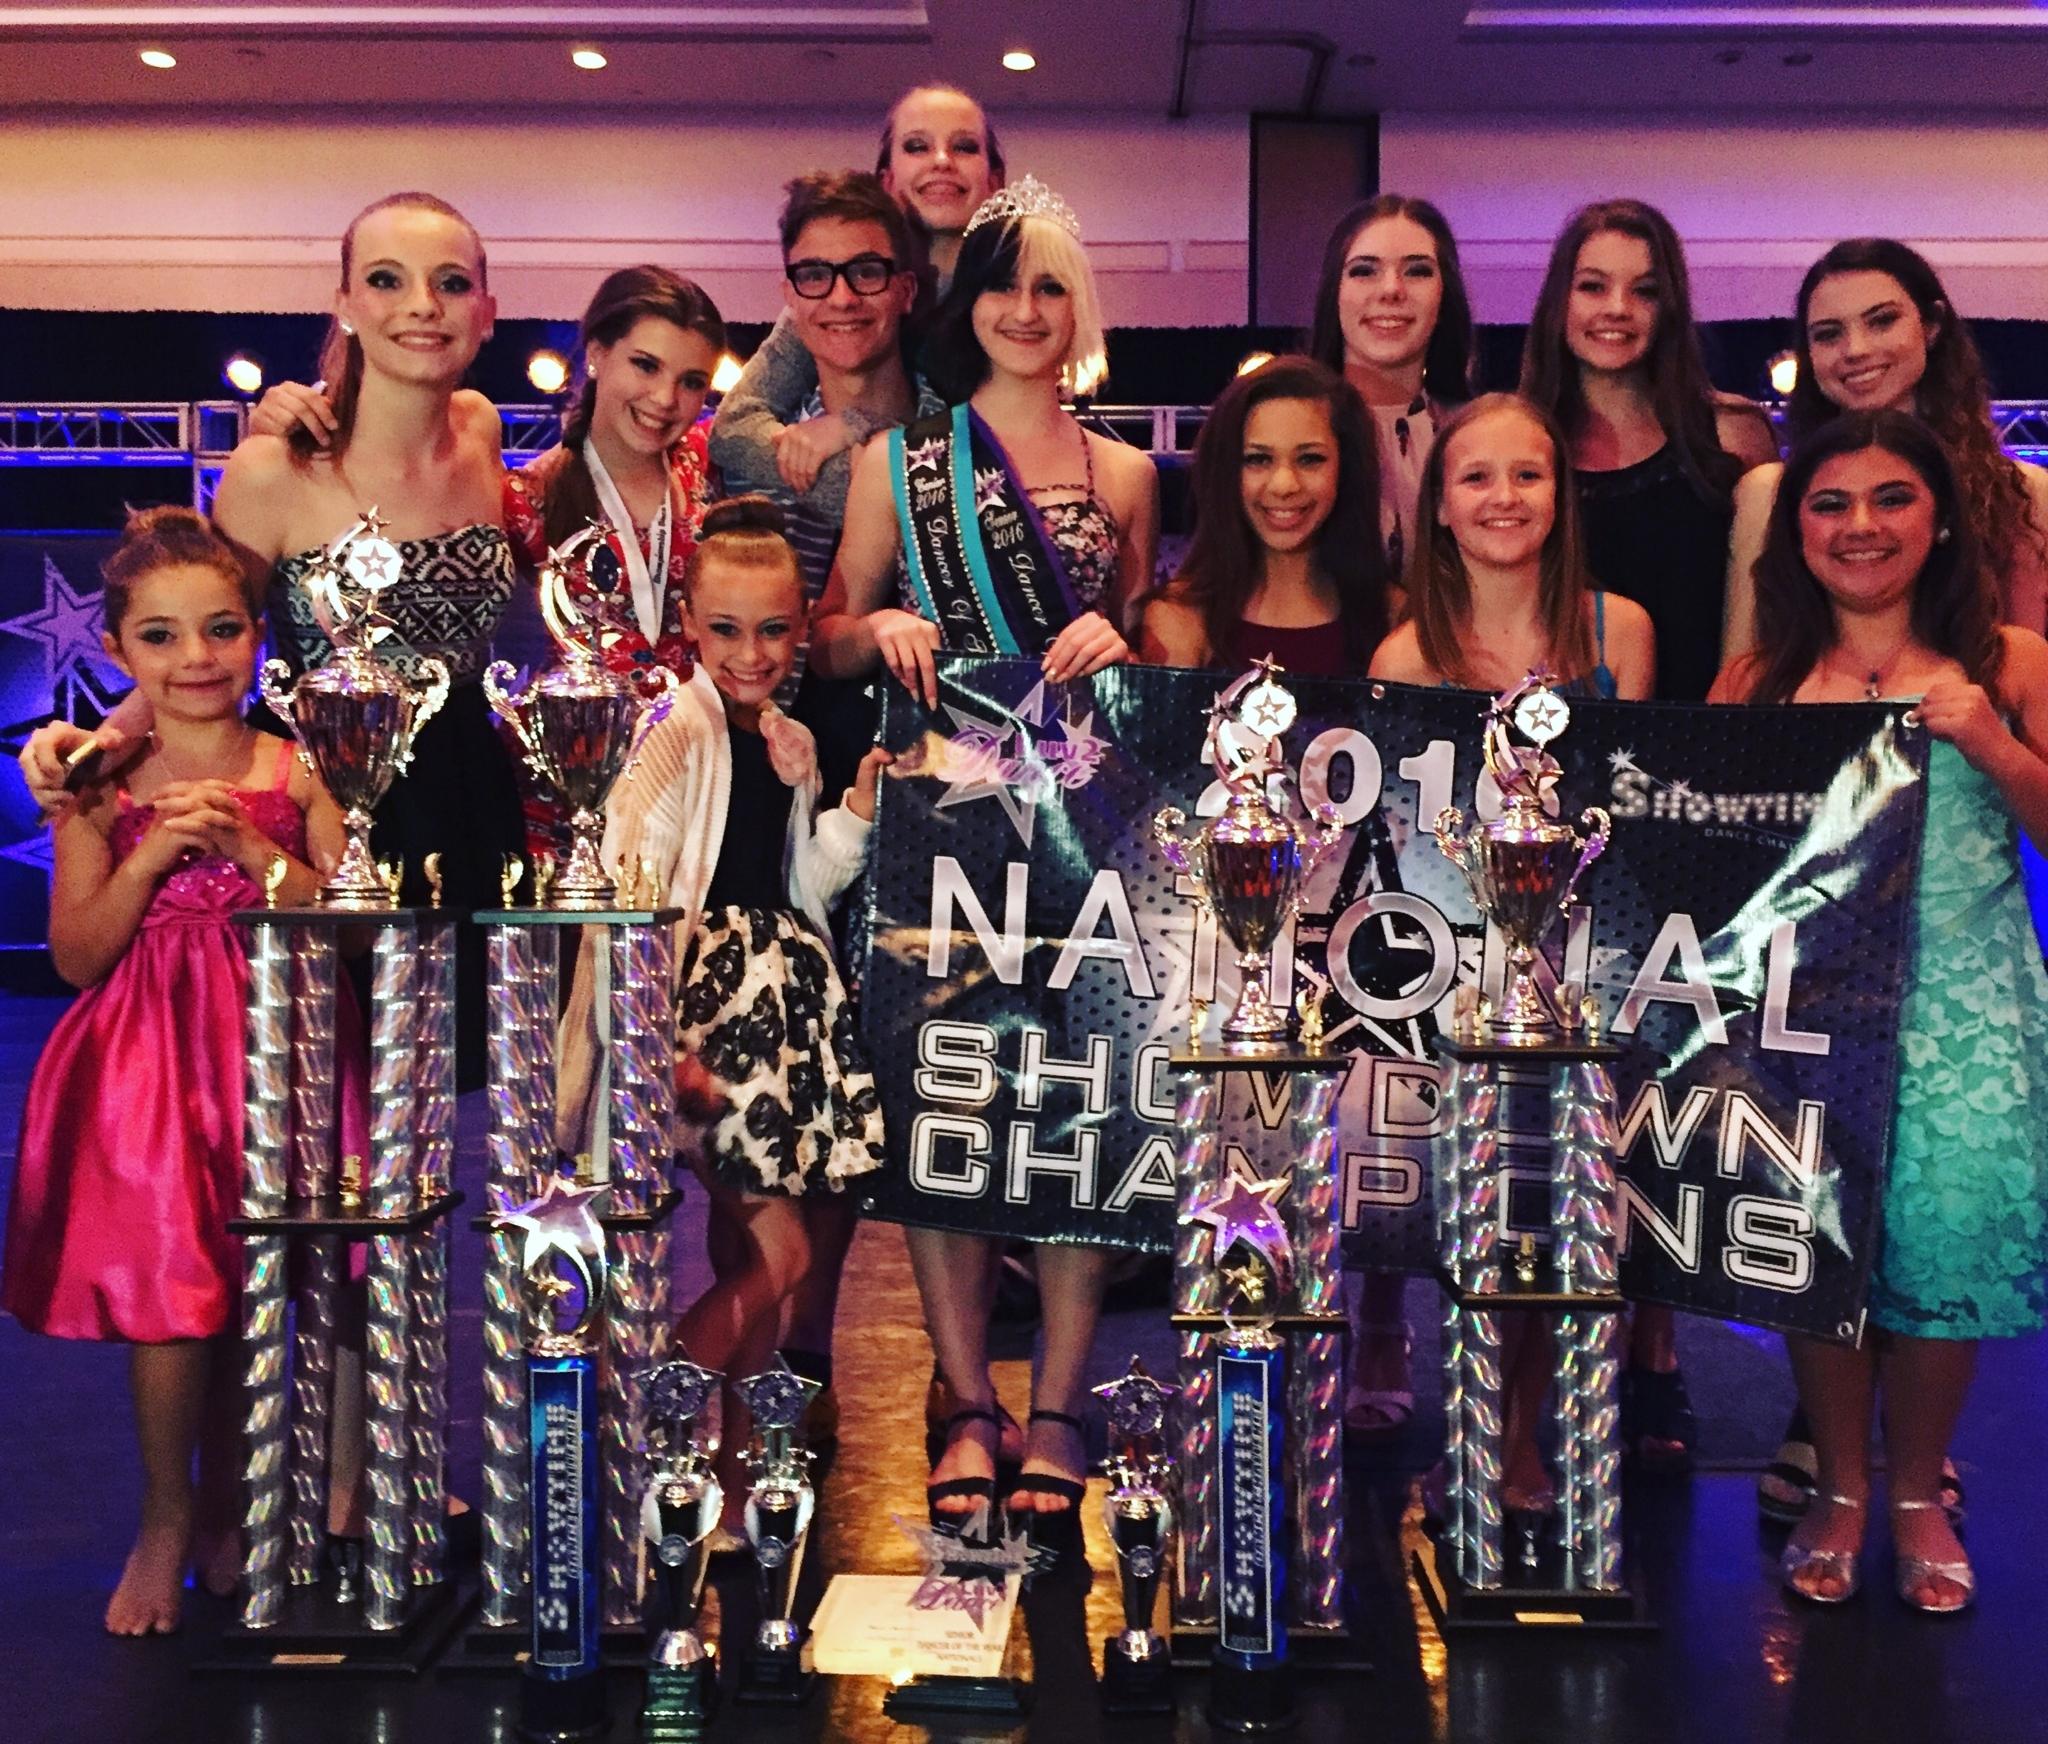 TK Danceworx in Kingston: Top Scoring Studio Nationals Orlando 2016